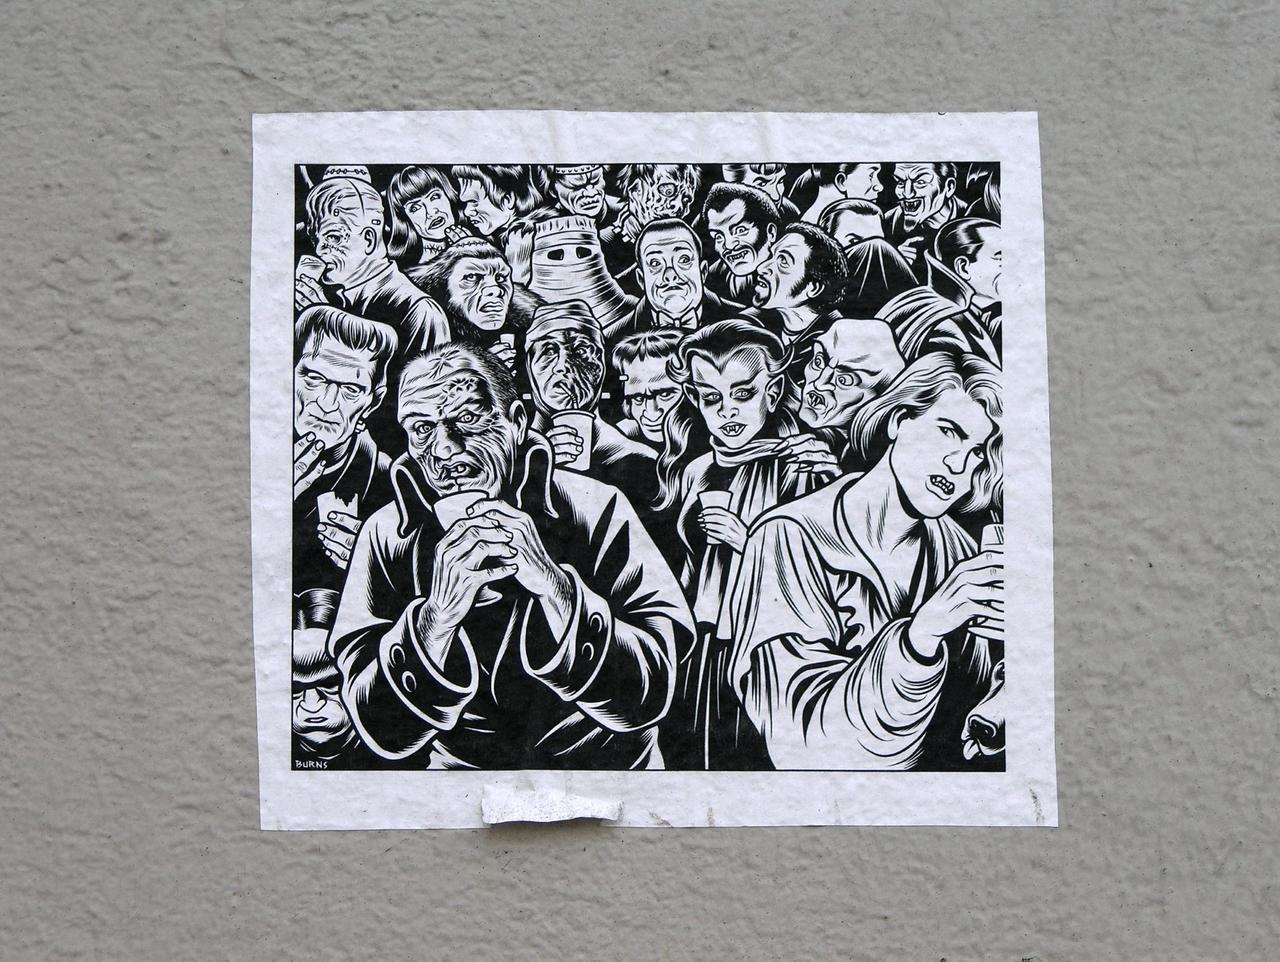 Streetart 1653 by cmdpirxII